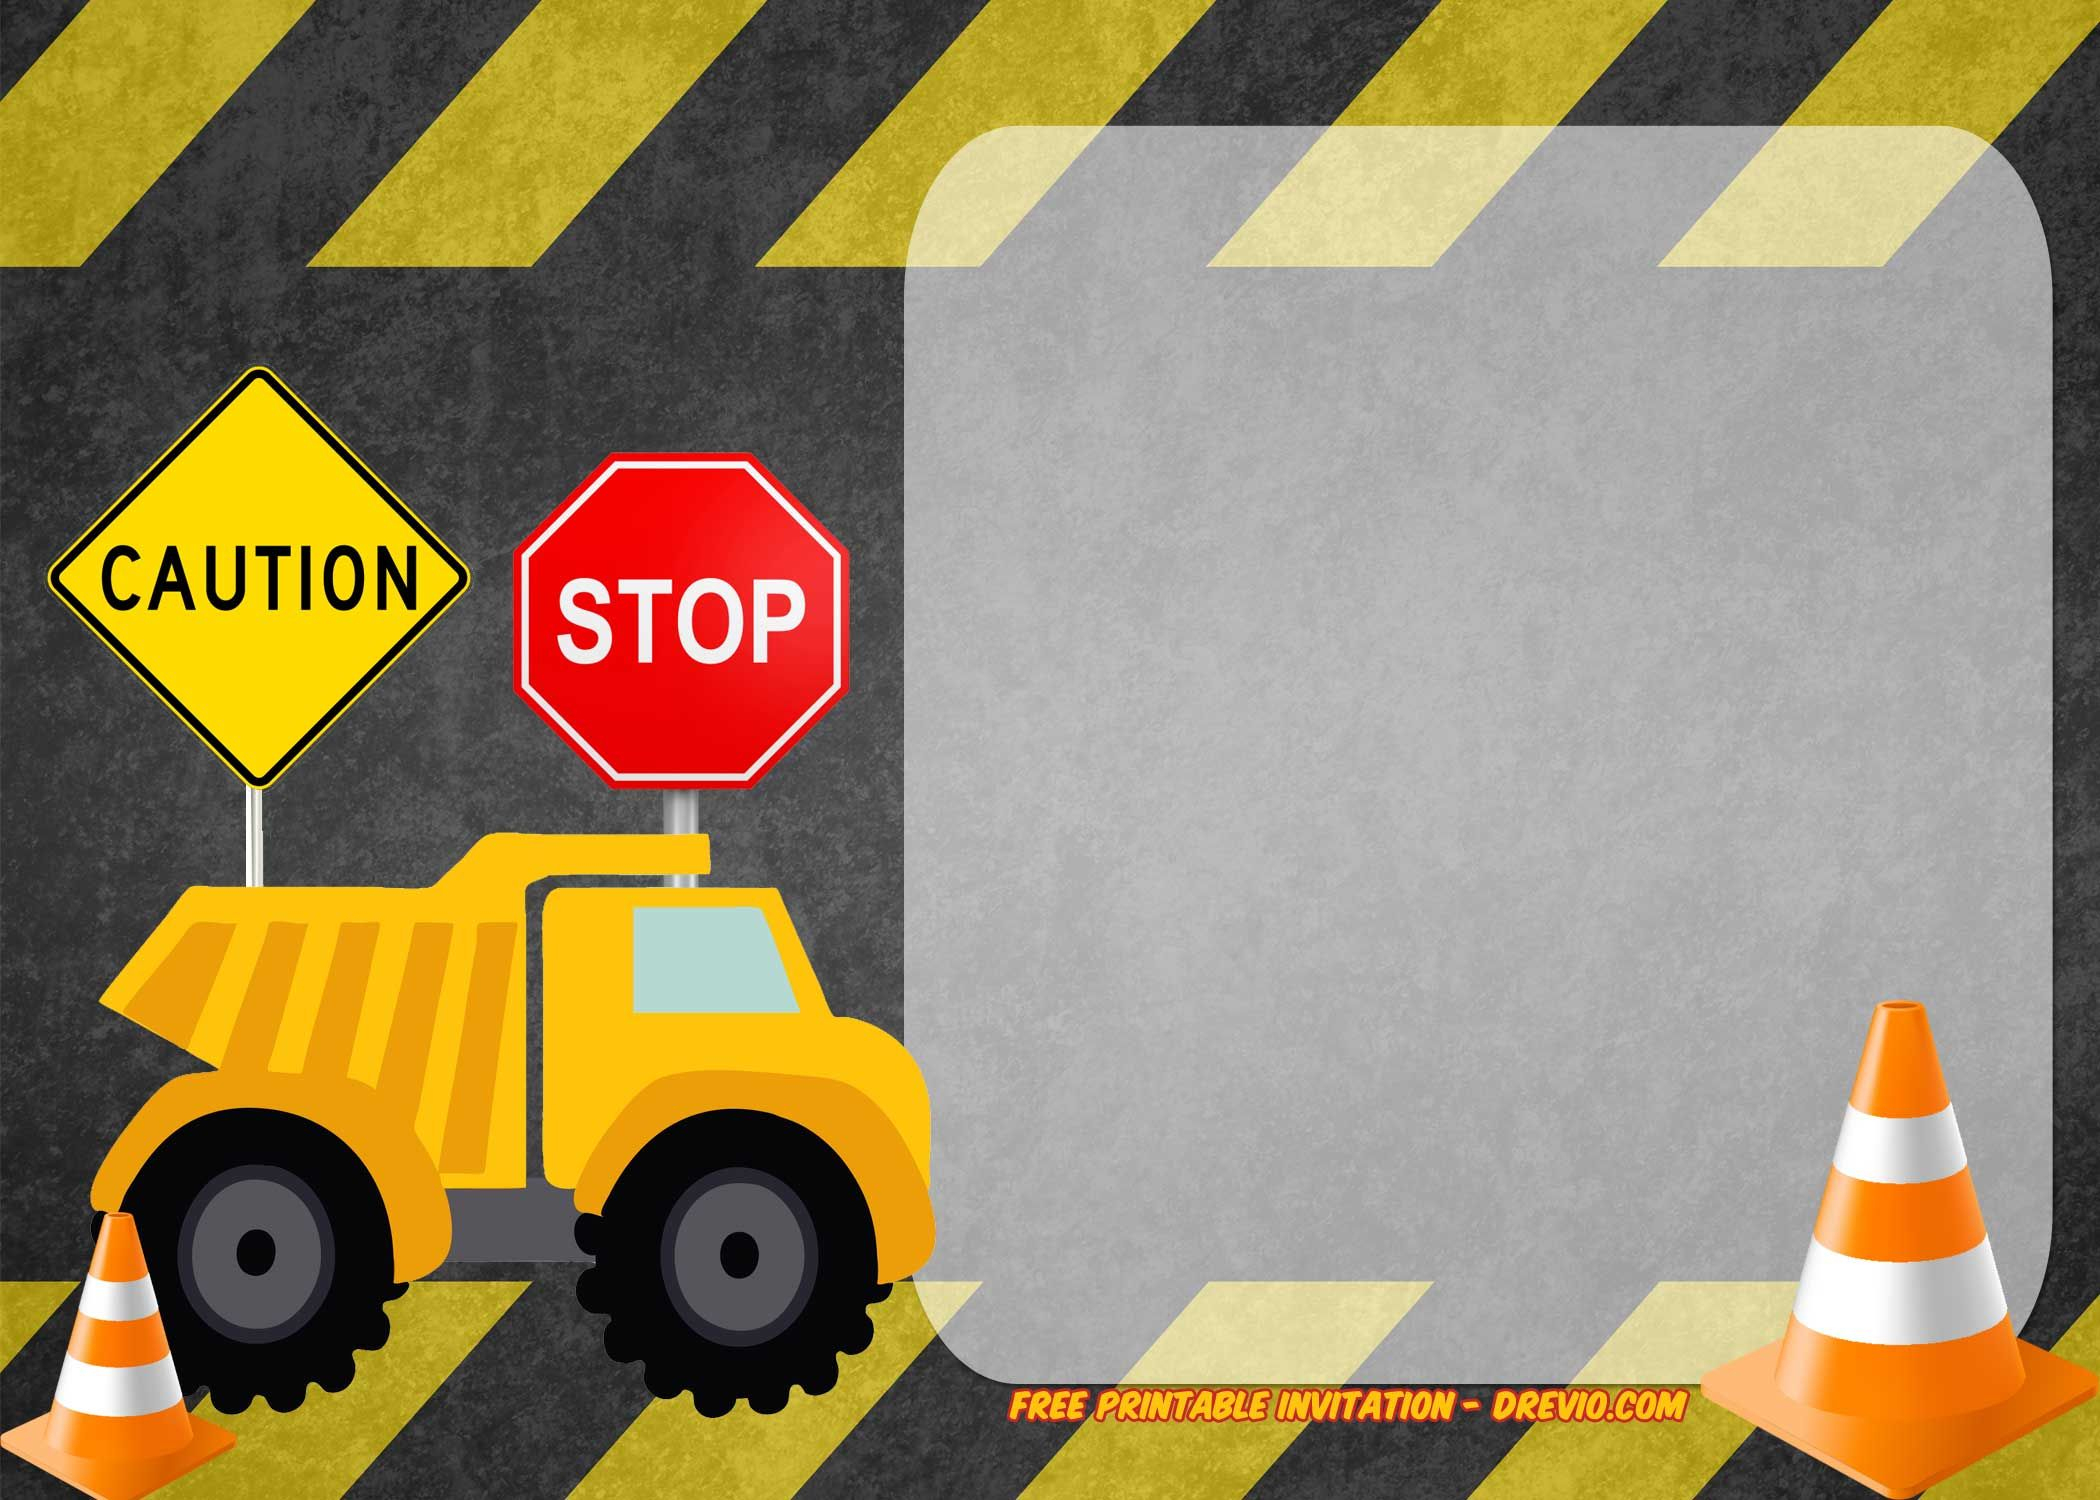 Free Printable Construction Vehicles Birthday Invitation Templates - Free Printable Construction Birthday Invitation Templates